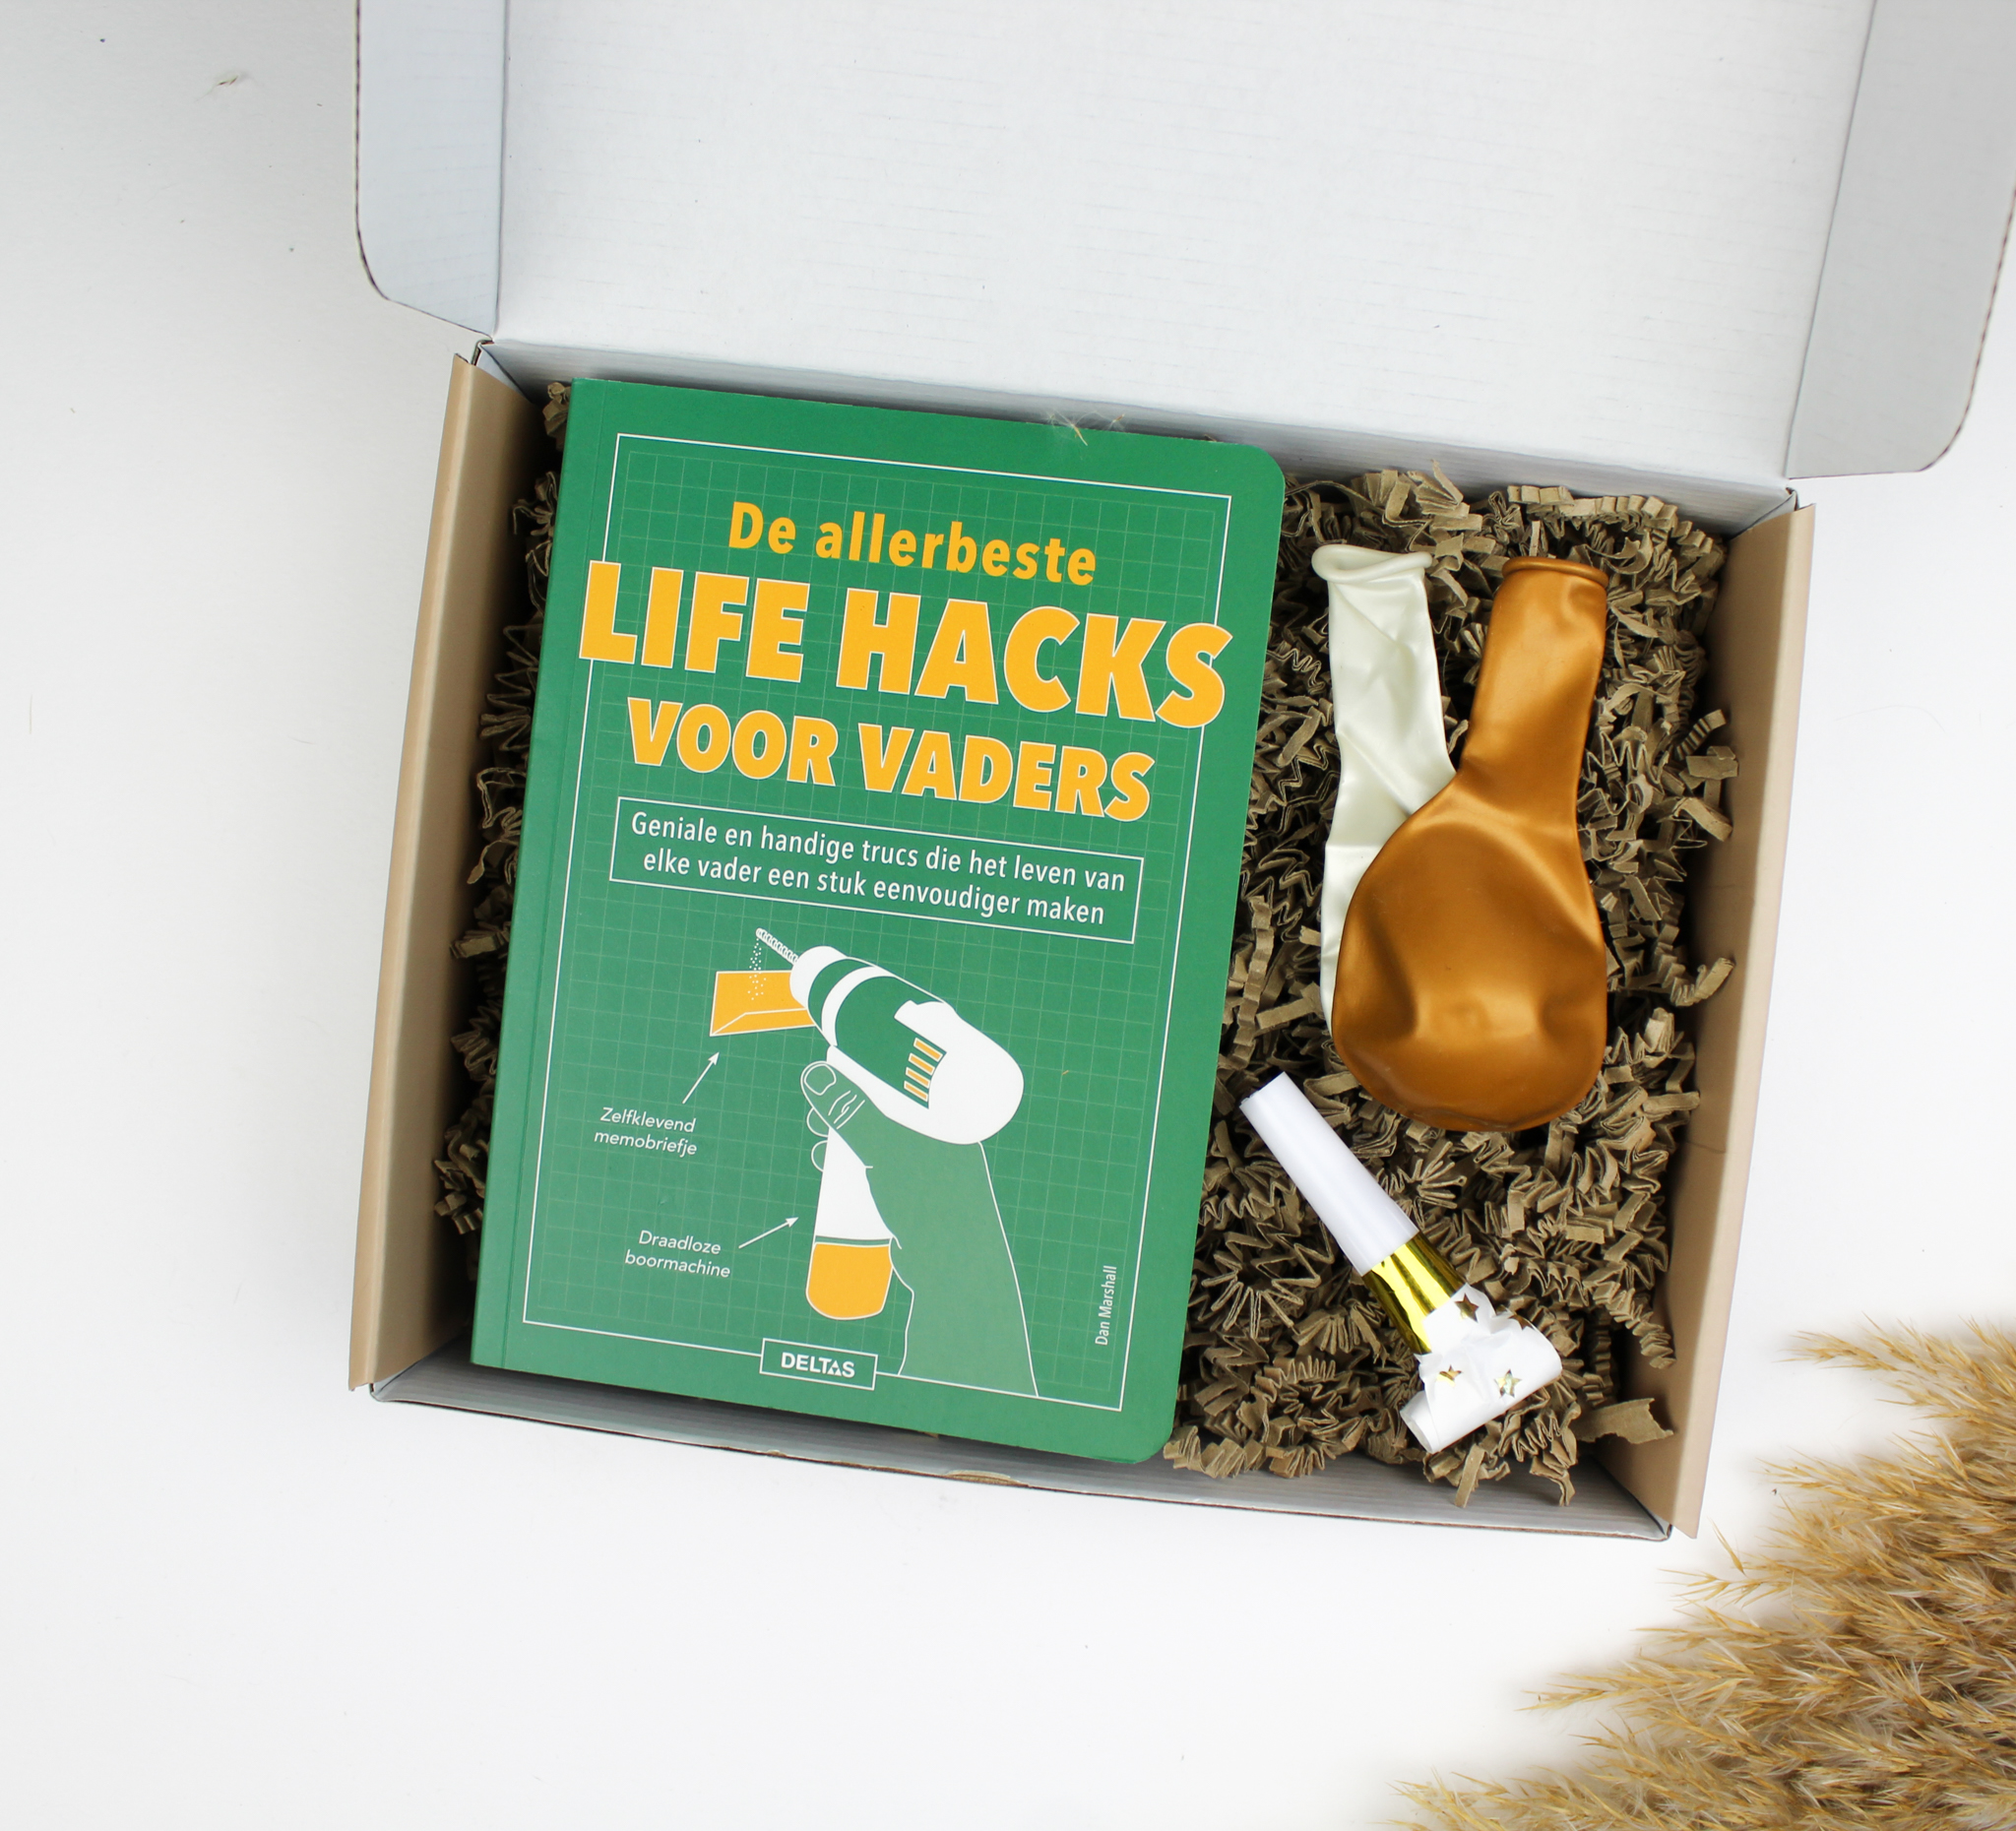 cadeau cadeaupakketten cadeaupakket lifehacks lifehack ideefabriek vaders papa